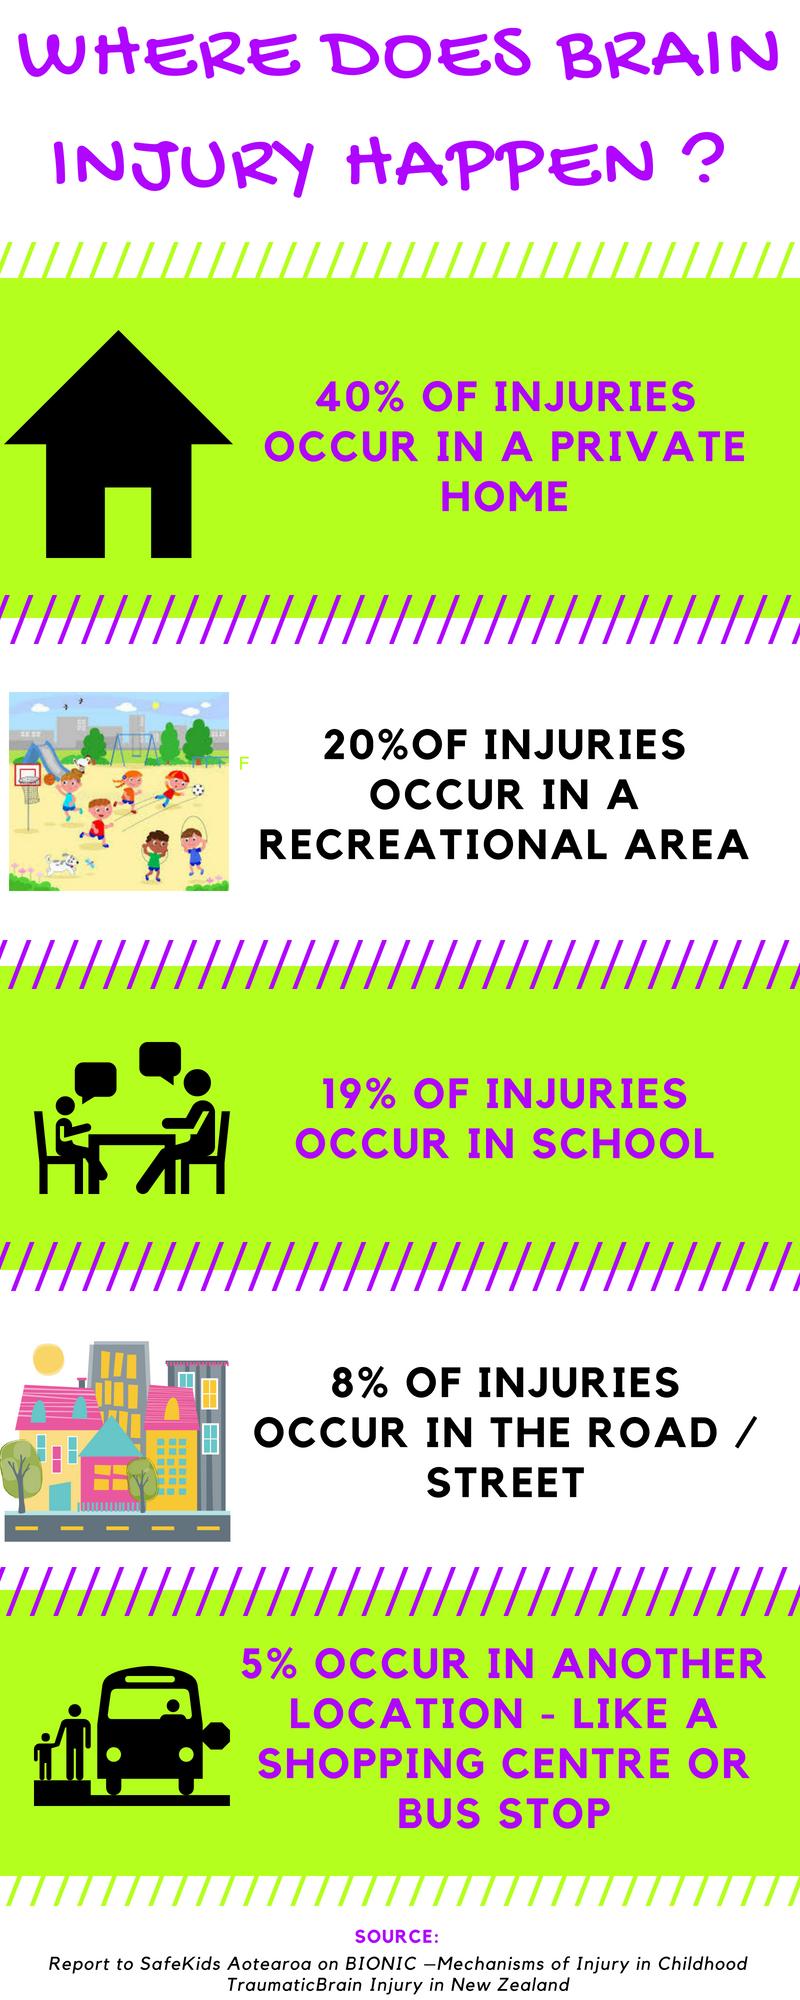 where does brain injury happen?